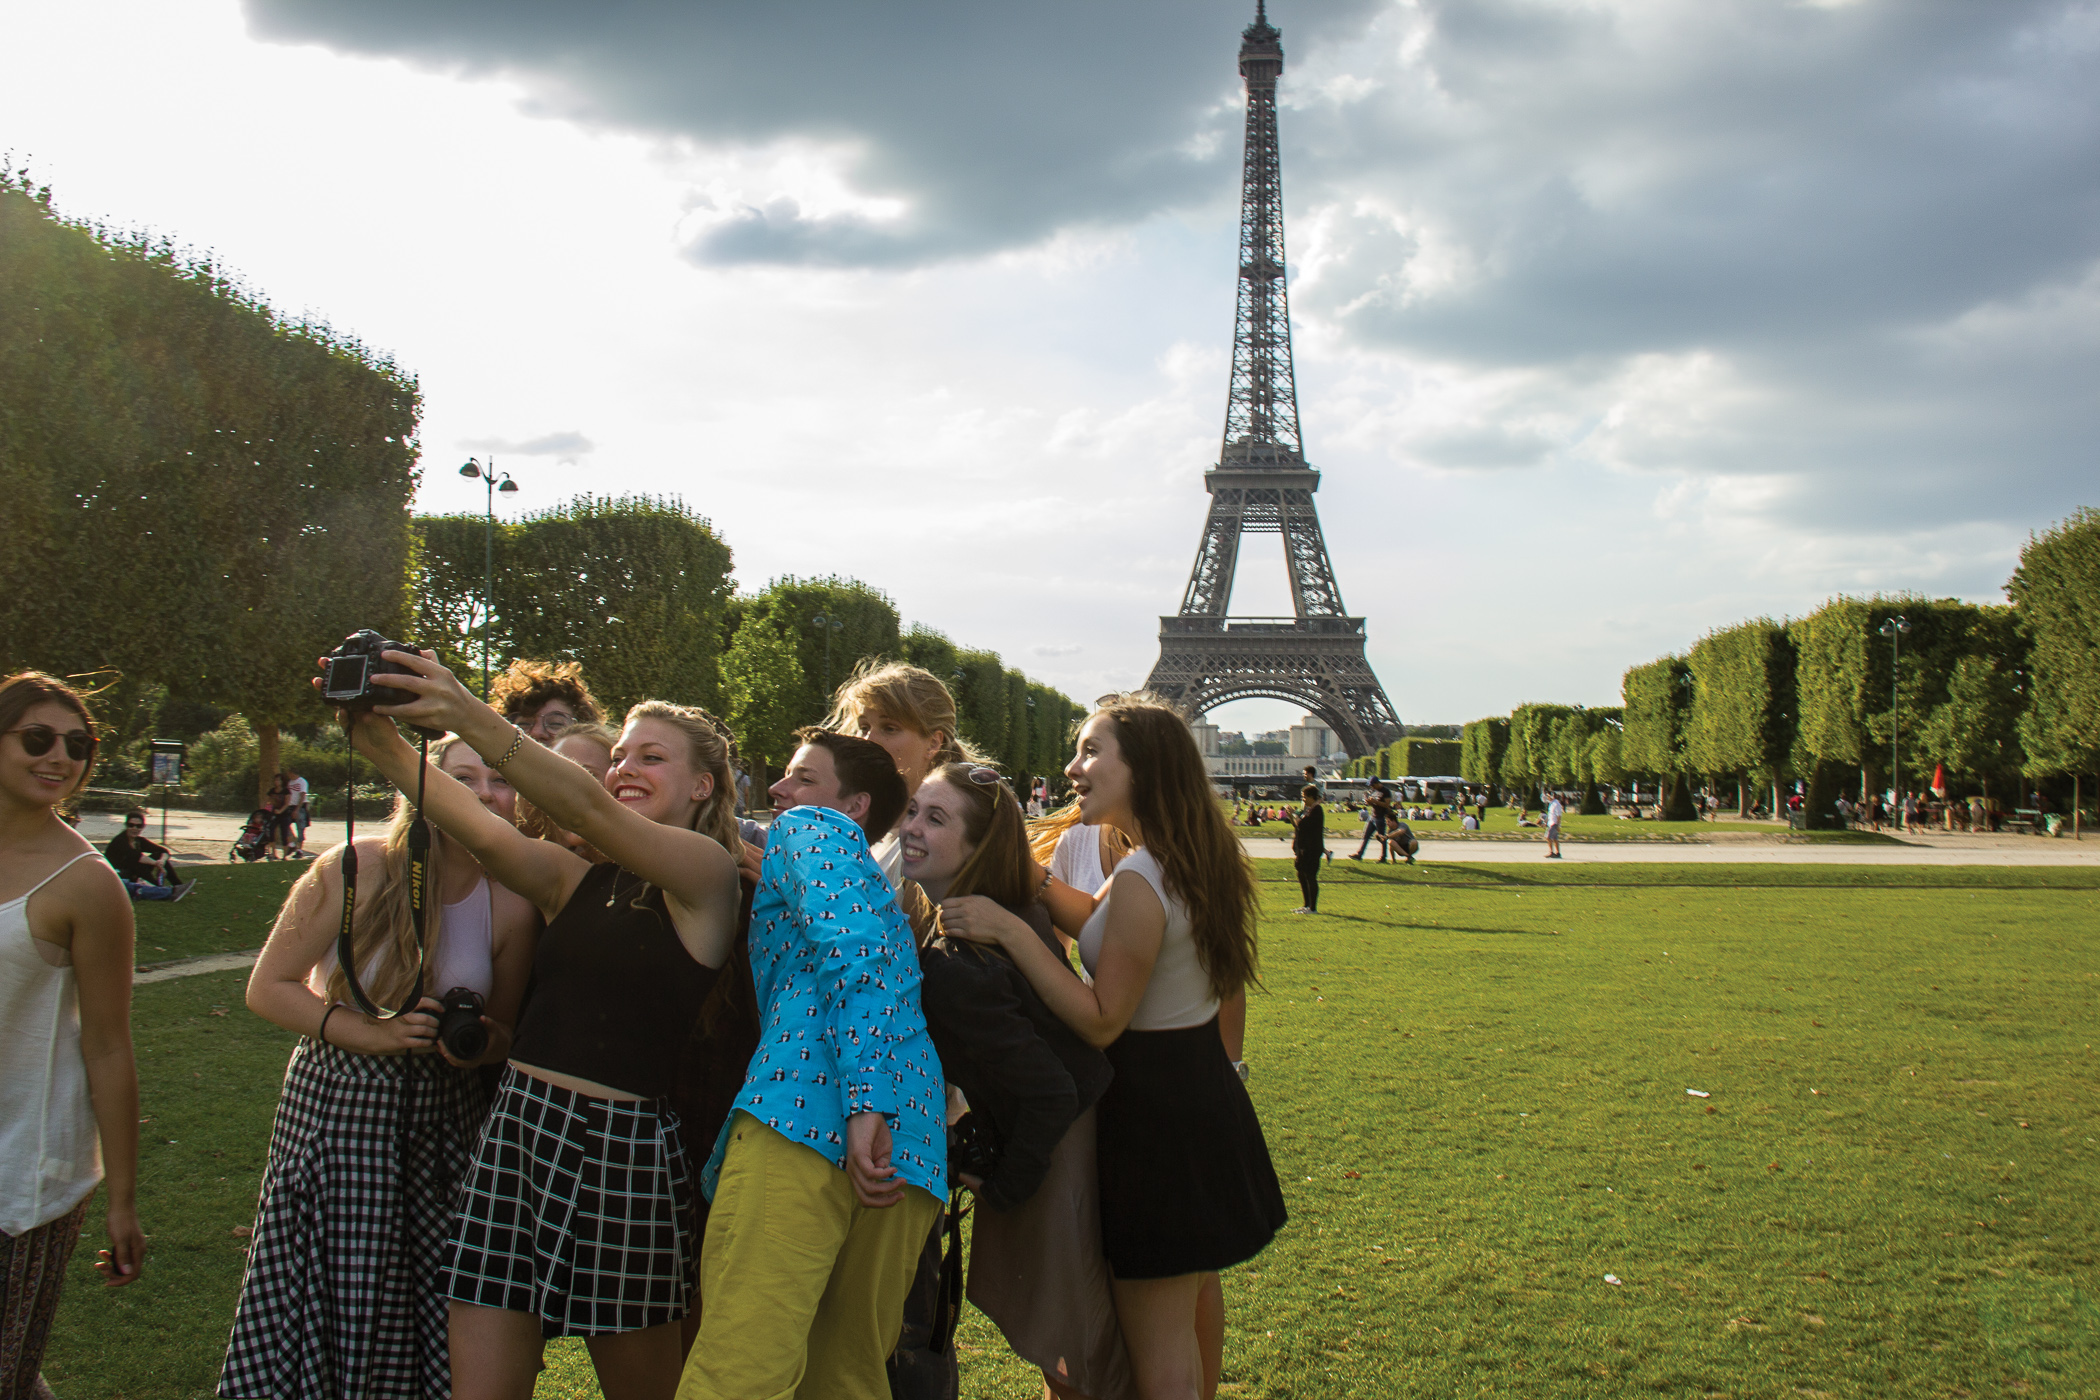 MEI International Academy: Summer Programs